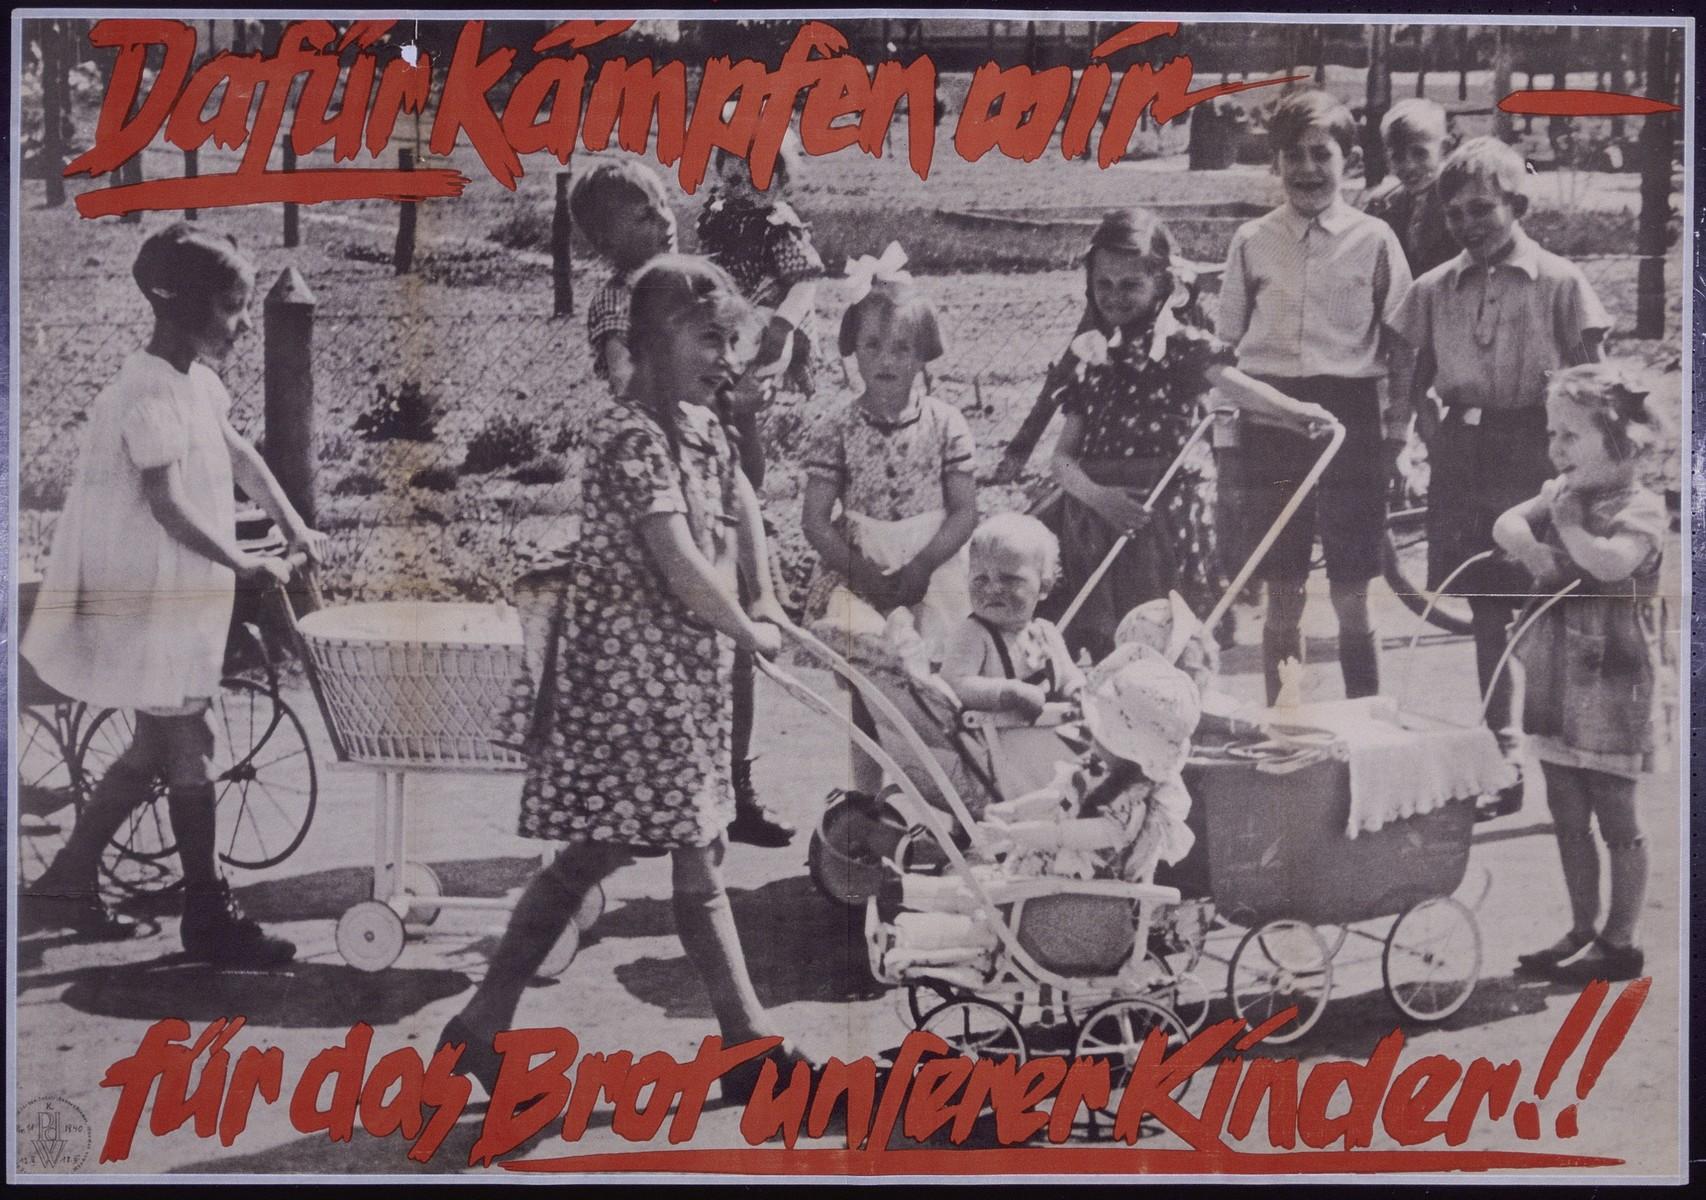 "Nazi propaganda poster entitled, ""Dafur kampfen wir - fur das Brot unsrer Kinder!!"", issued by the ""Parole der Woche,"" a wall newspaper (Wandzeitung) published by the National Socialist Party propaganda office in Munich."